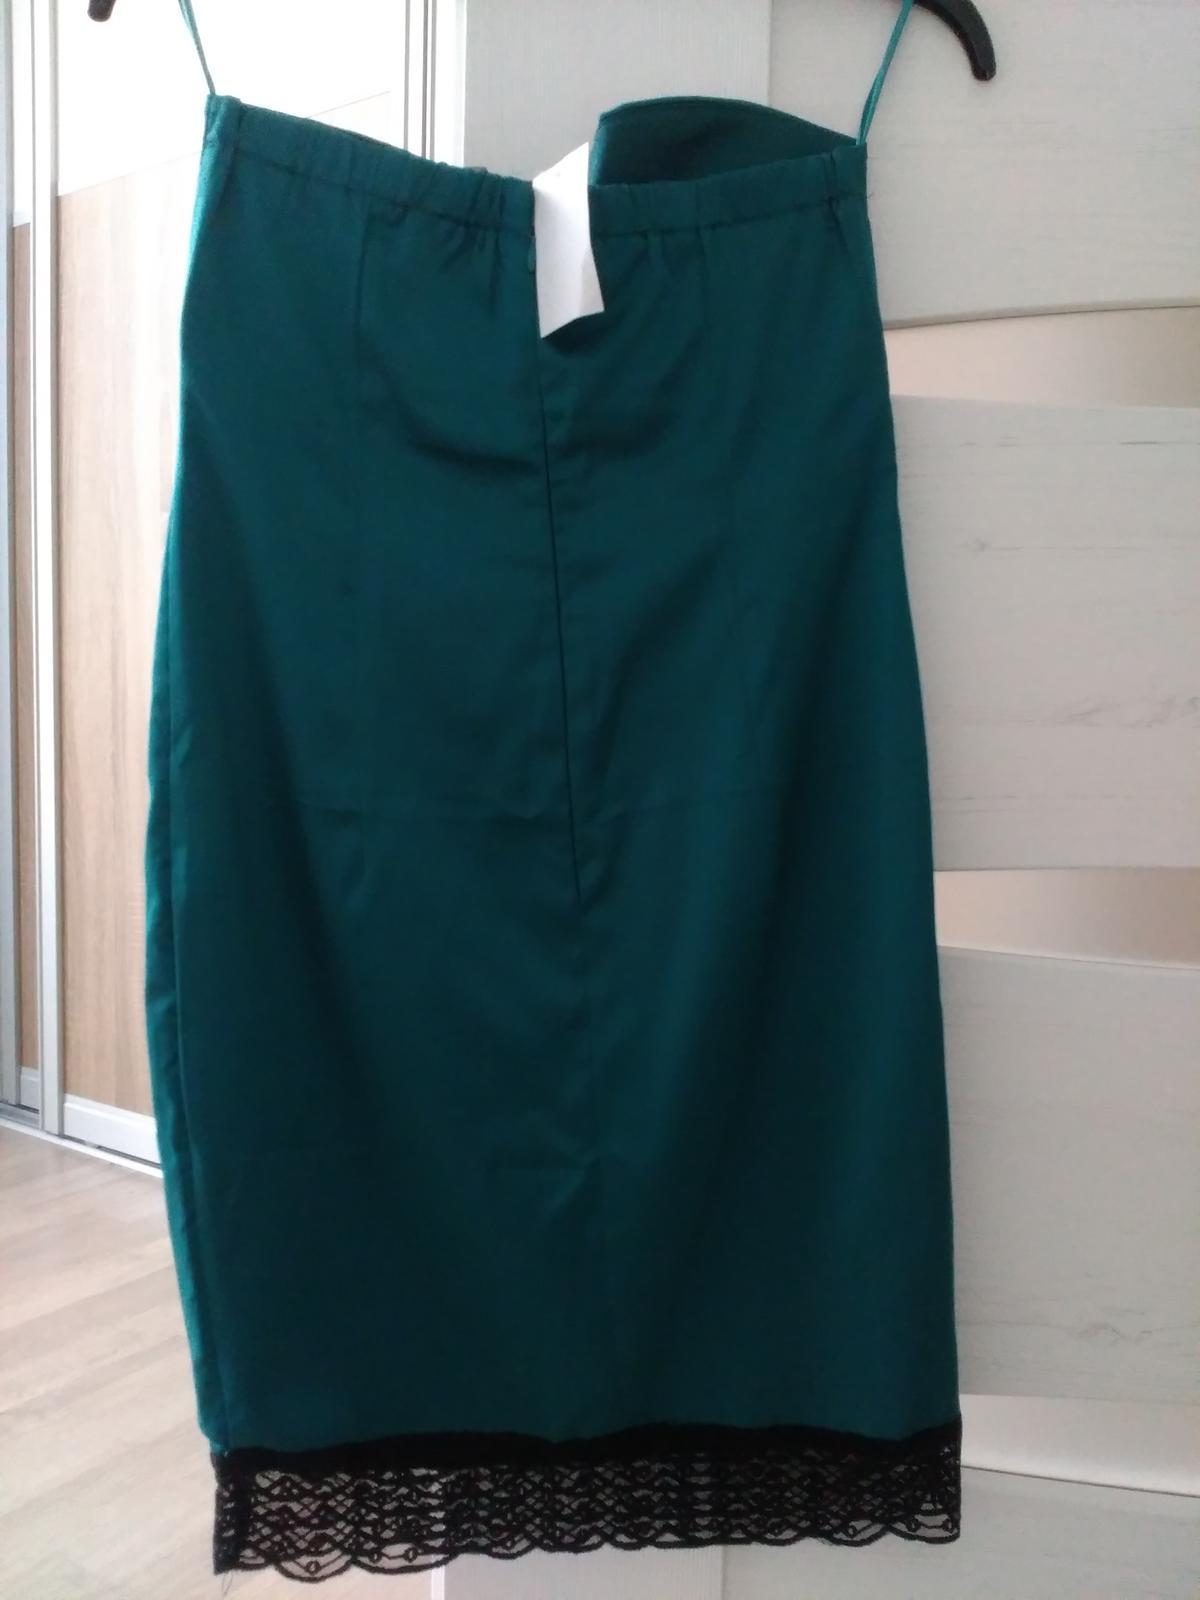 Tmavozelene šaty 34 - Obrázok č. 2